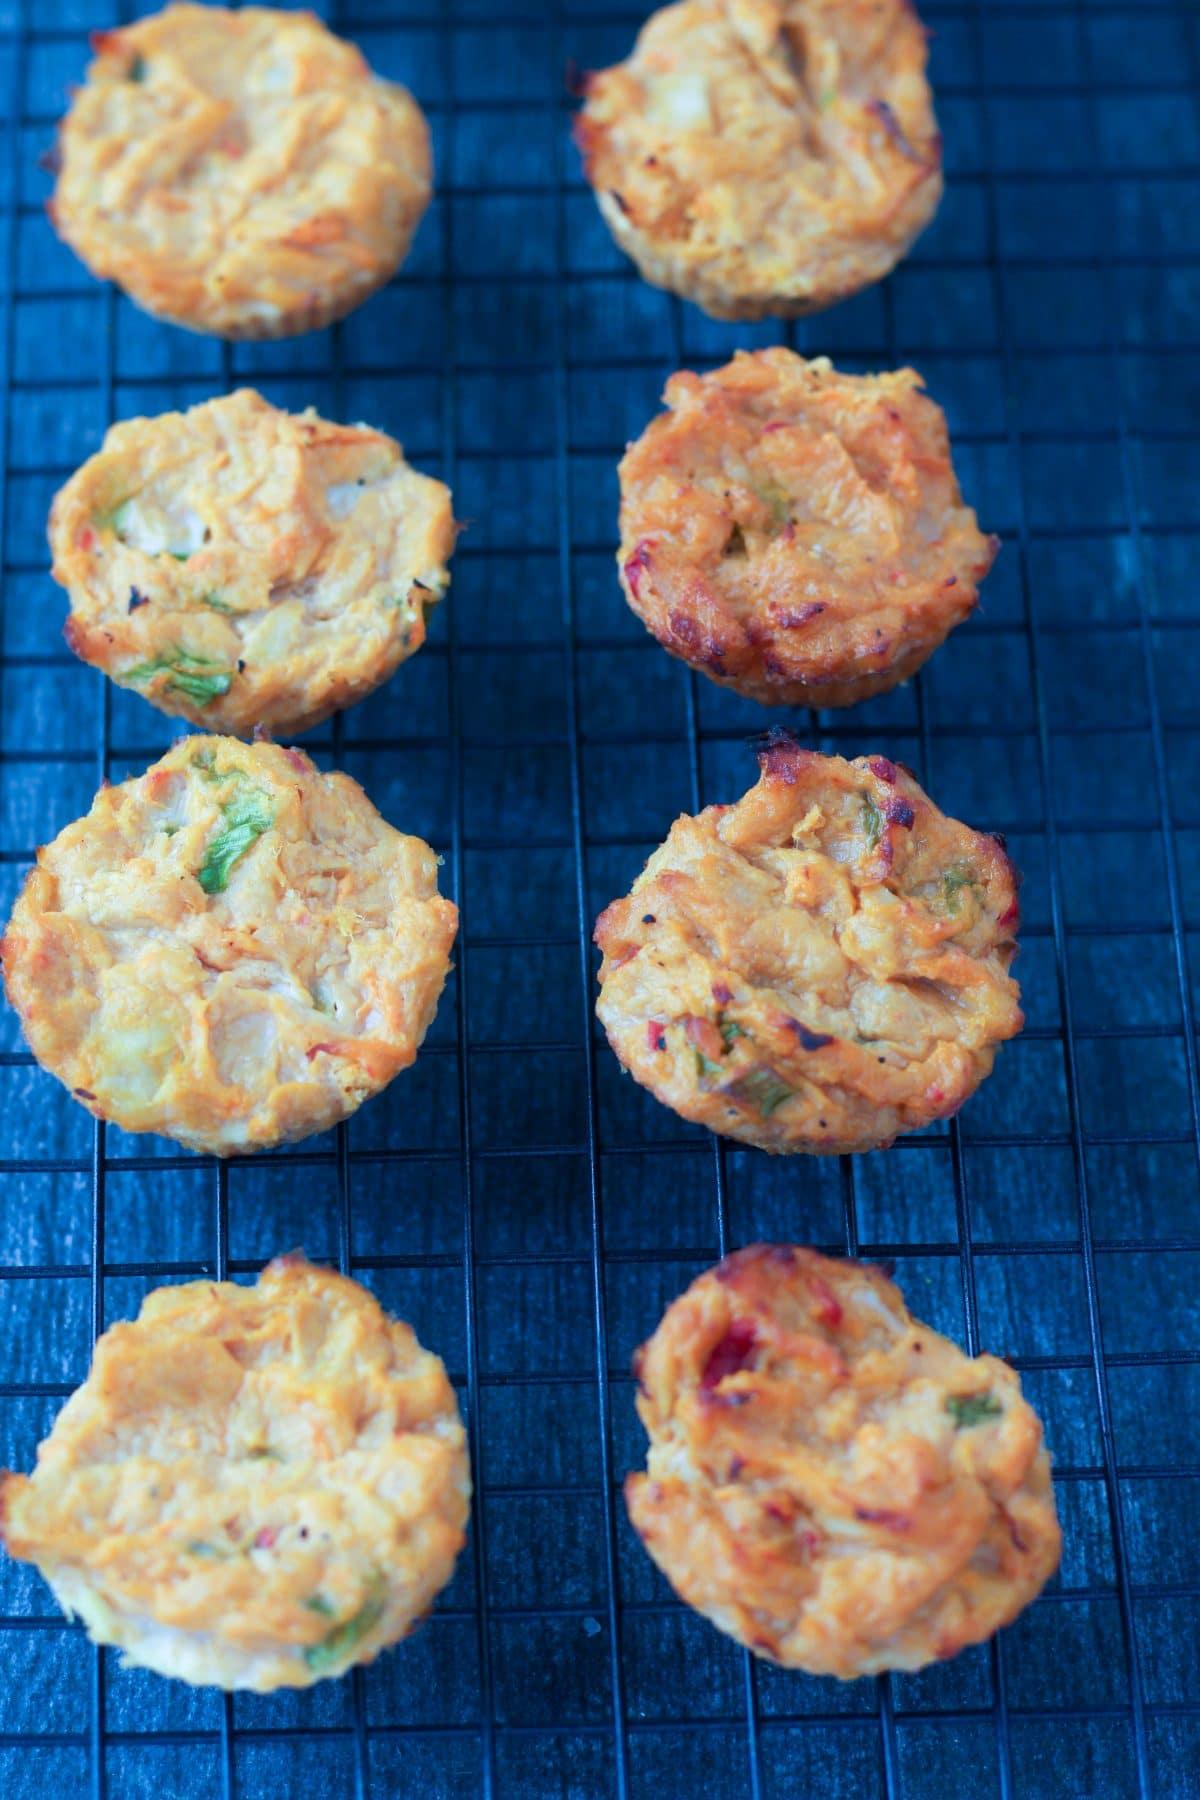 Spicy-Tuna-Hummus-Cakes-image